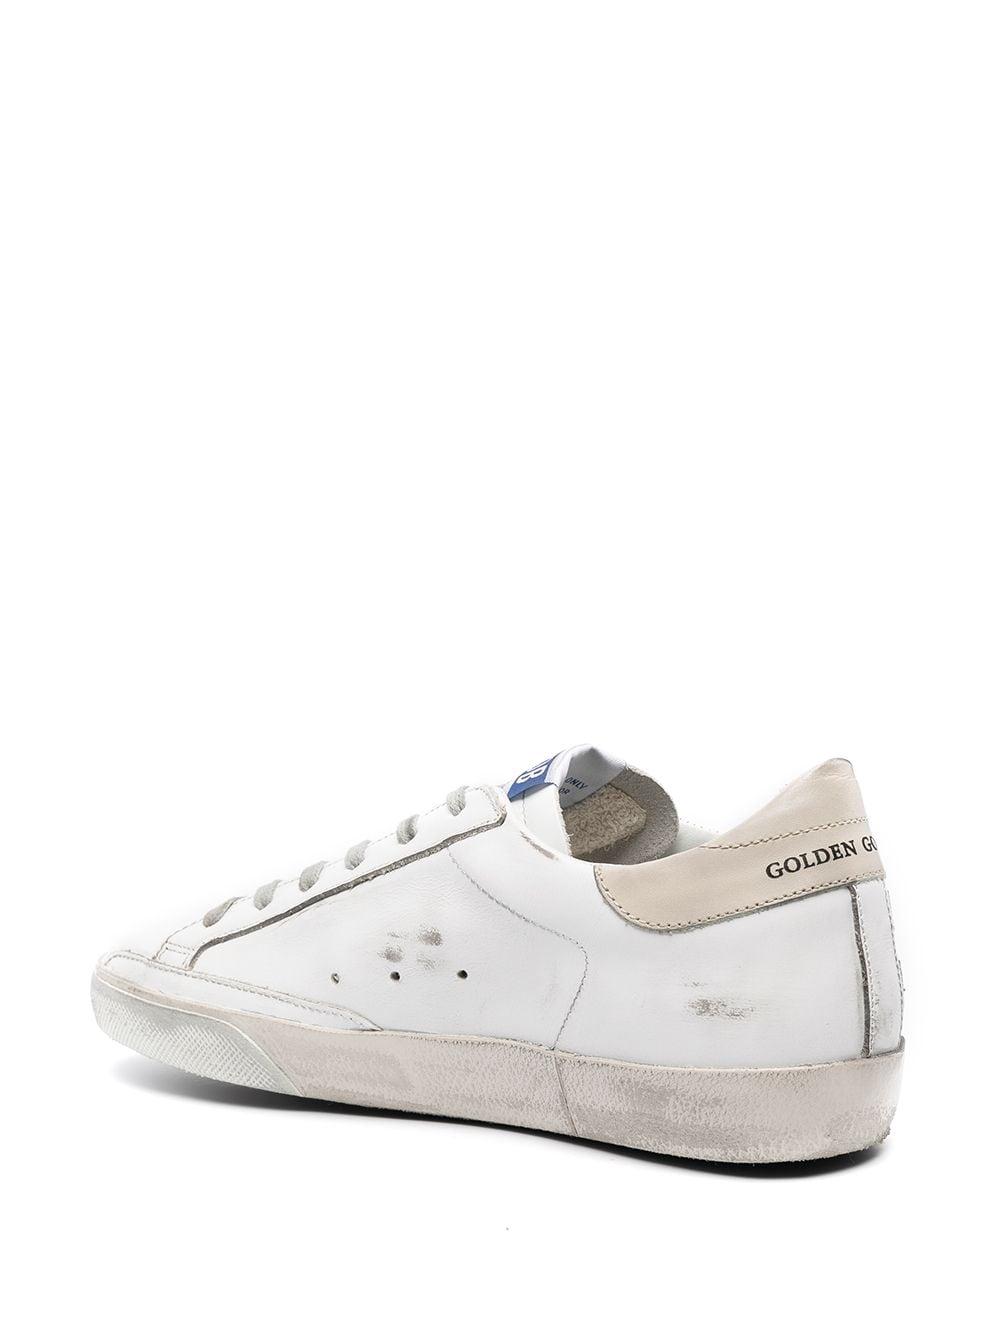 Picture of Golden Goose Deluxe Brand   Super-Star Flag-Motif Low-Top Sneakers